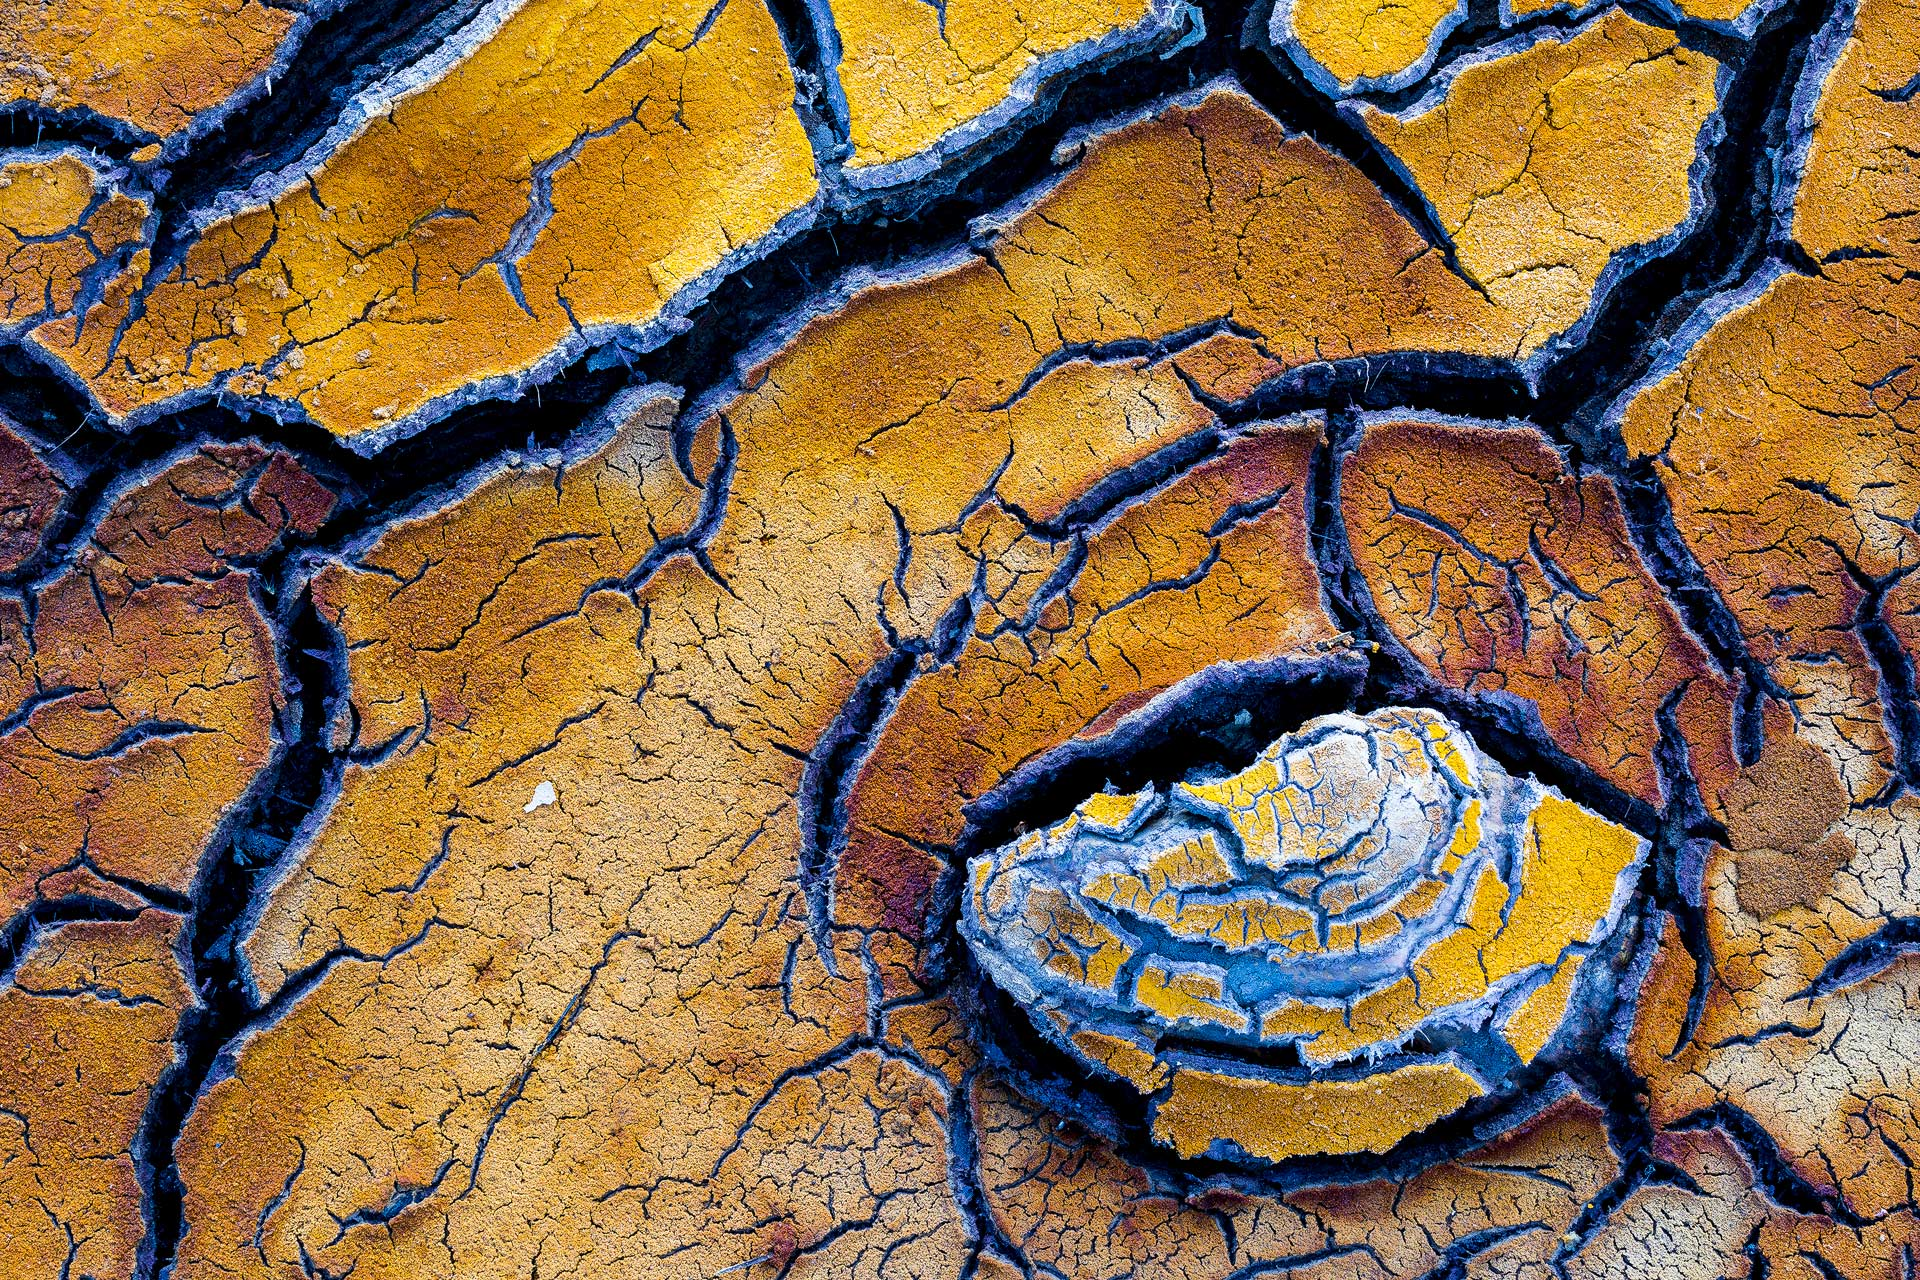 Javier Alonso Torre - Javier Alonso Torre Fotografía de naturaleza